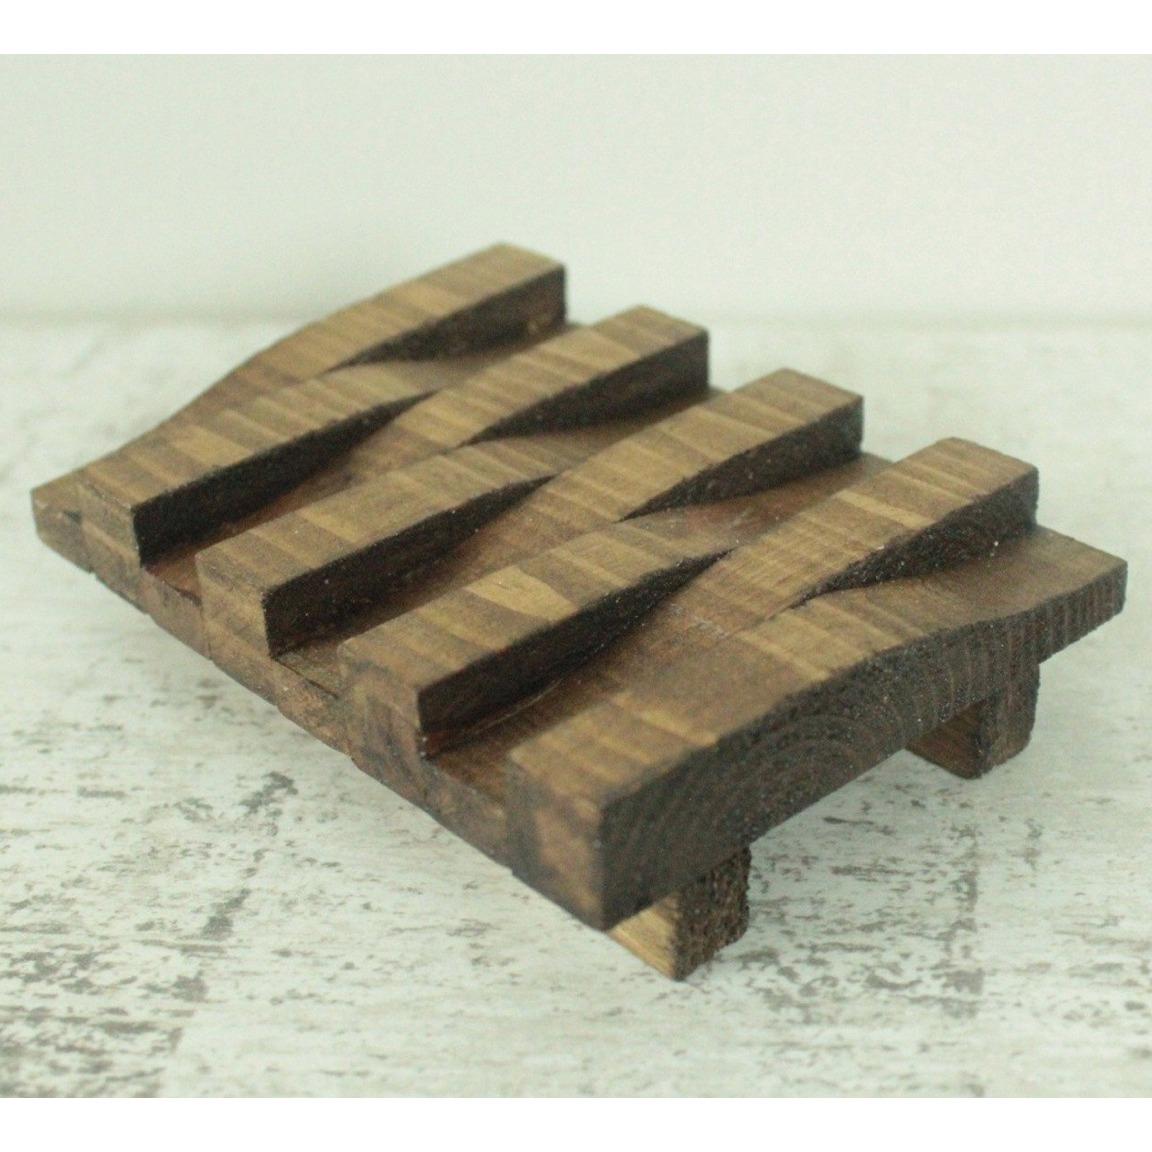 Wooden Soap Dish - Dark Wood Finish